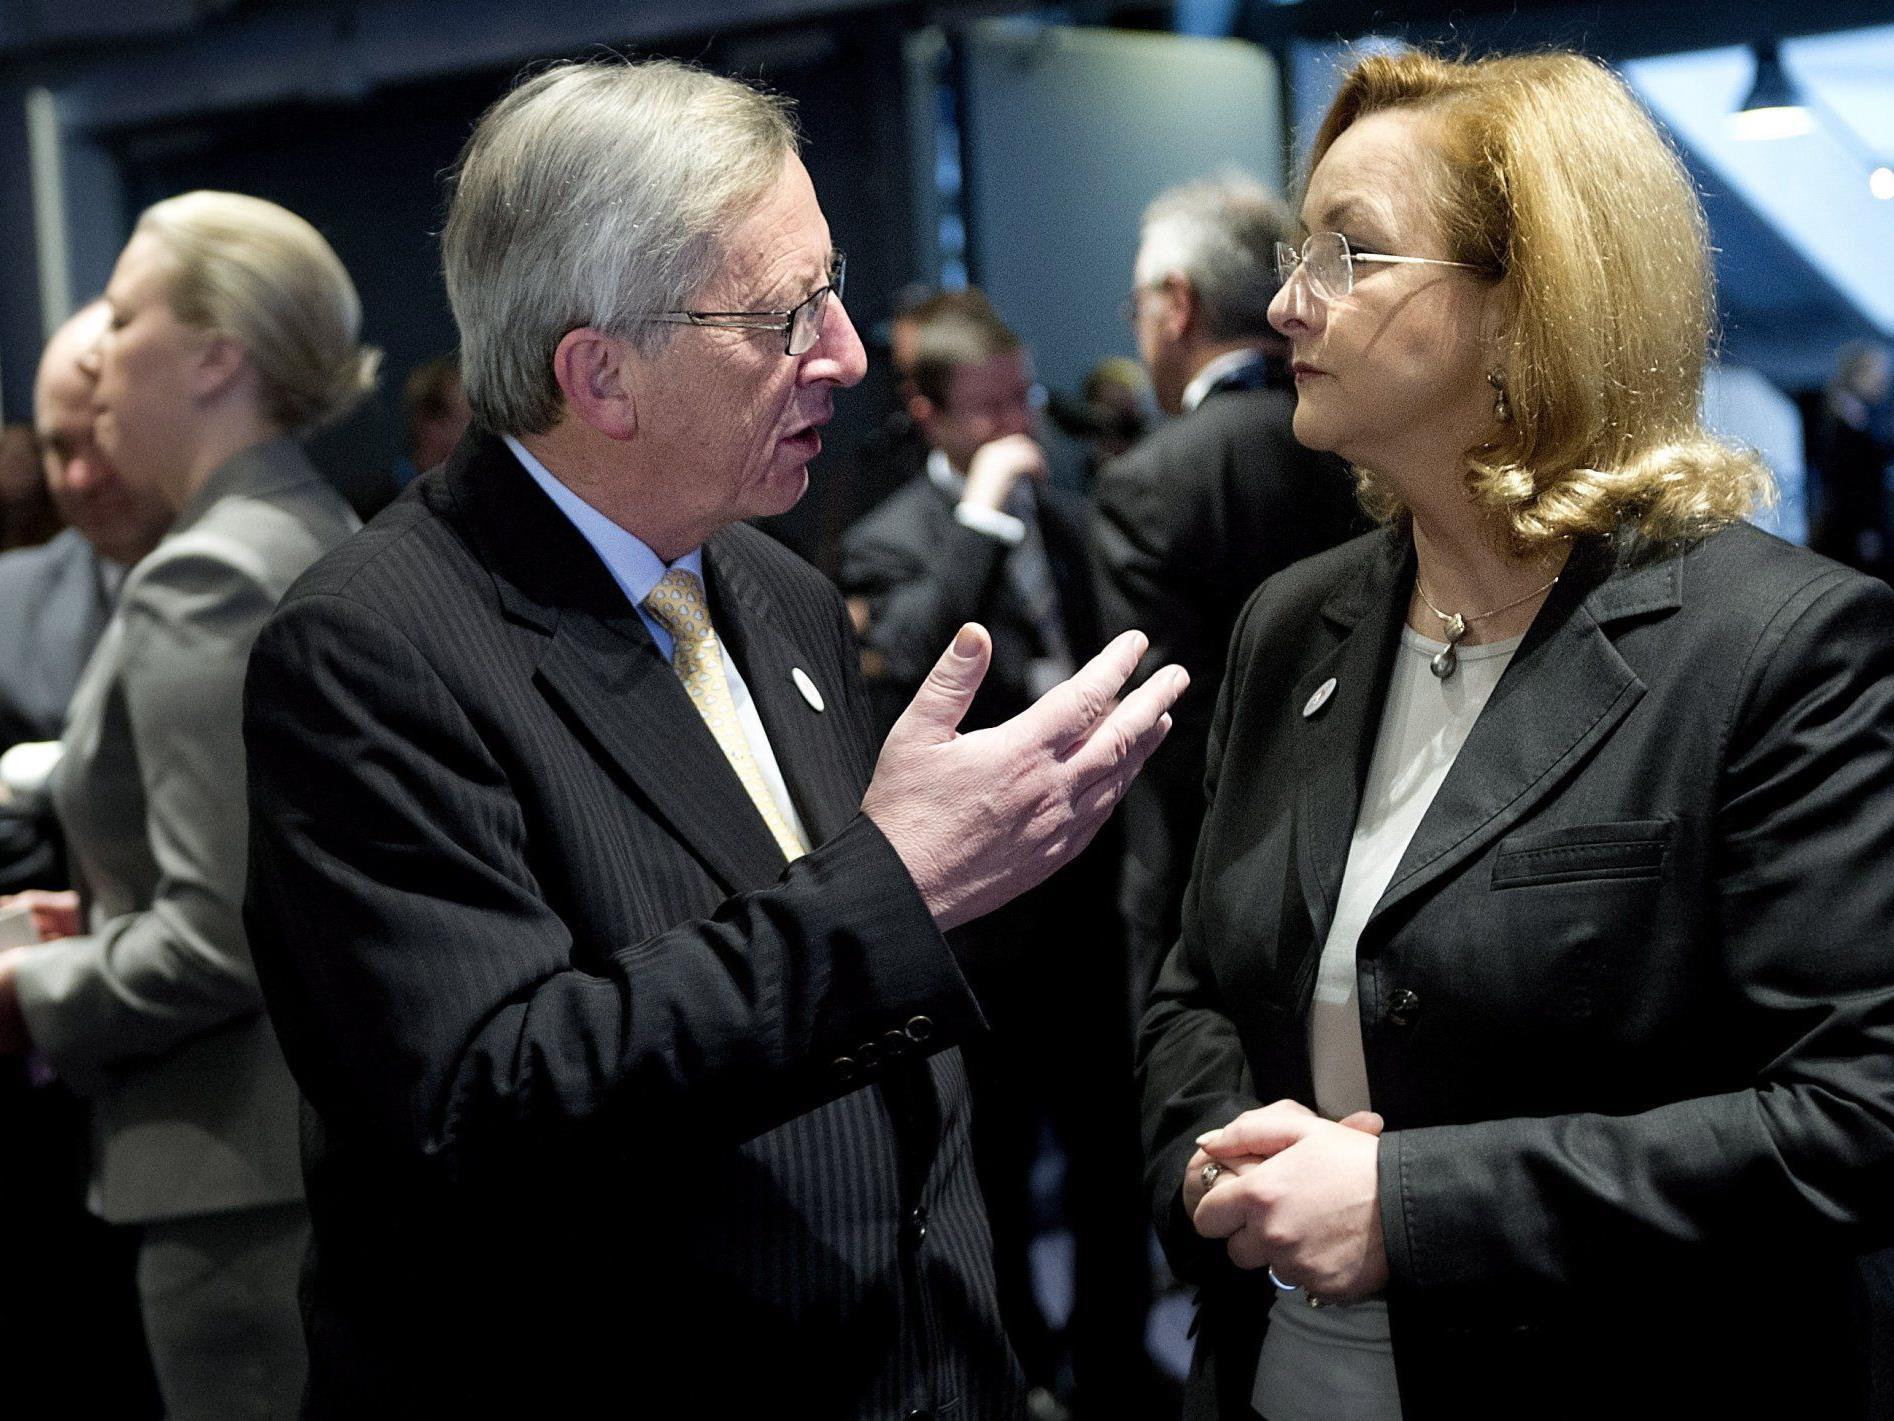 Maria Fekter mit Jean-Claude Juncker am Freitag in Kopenhagen.